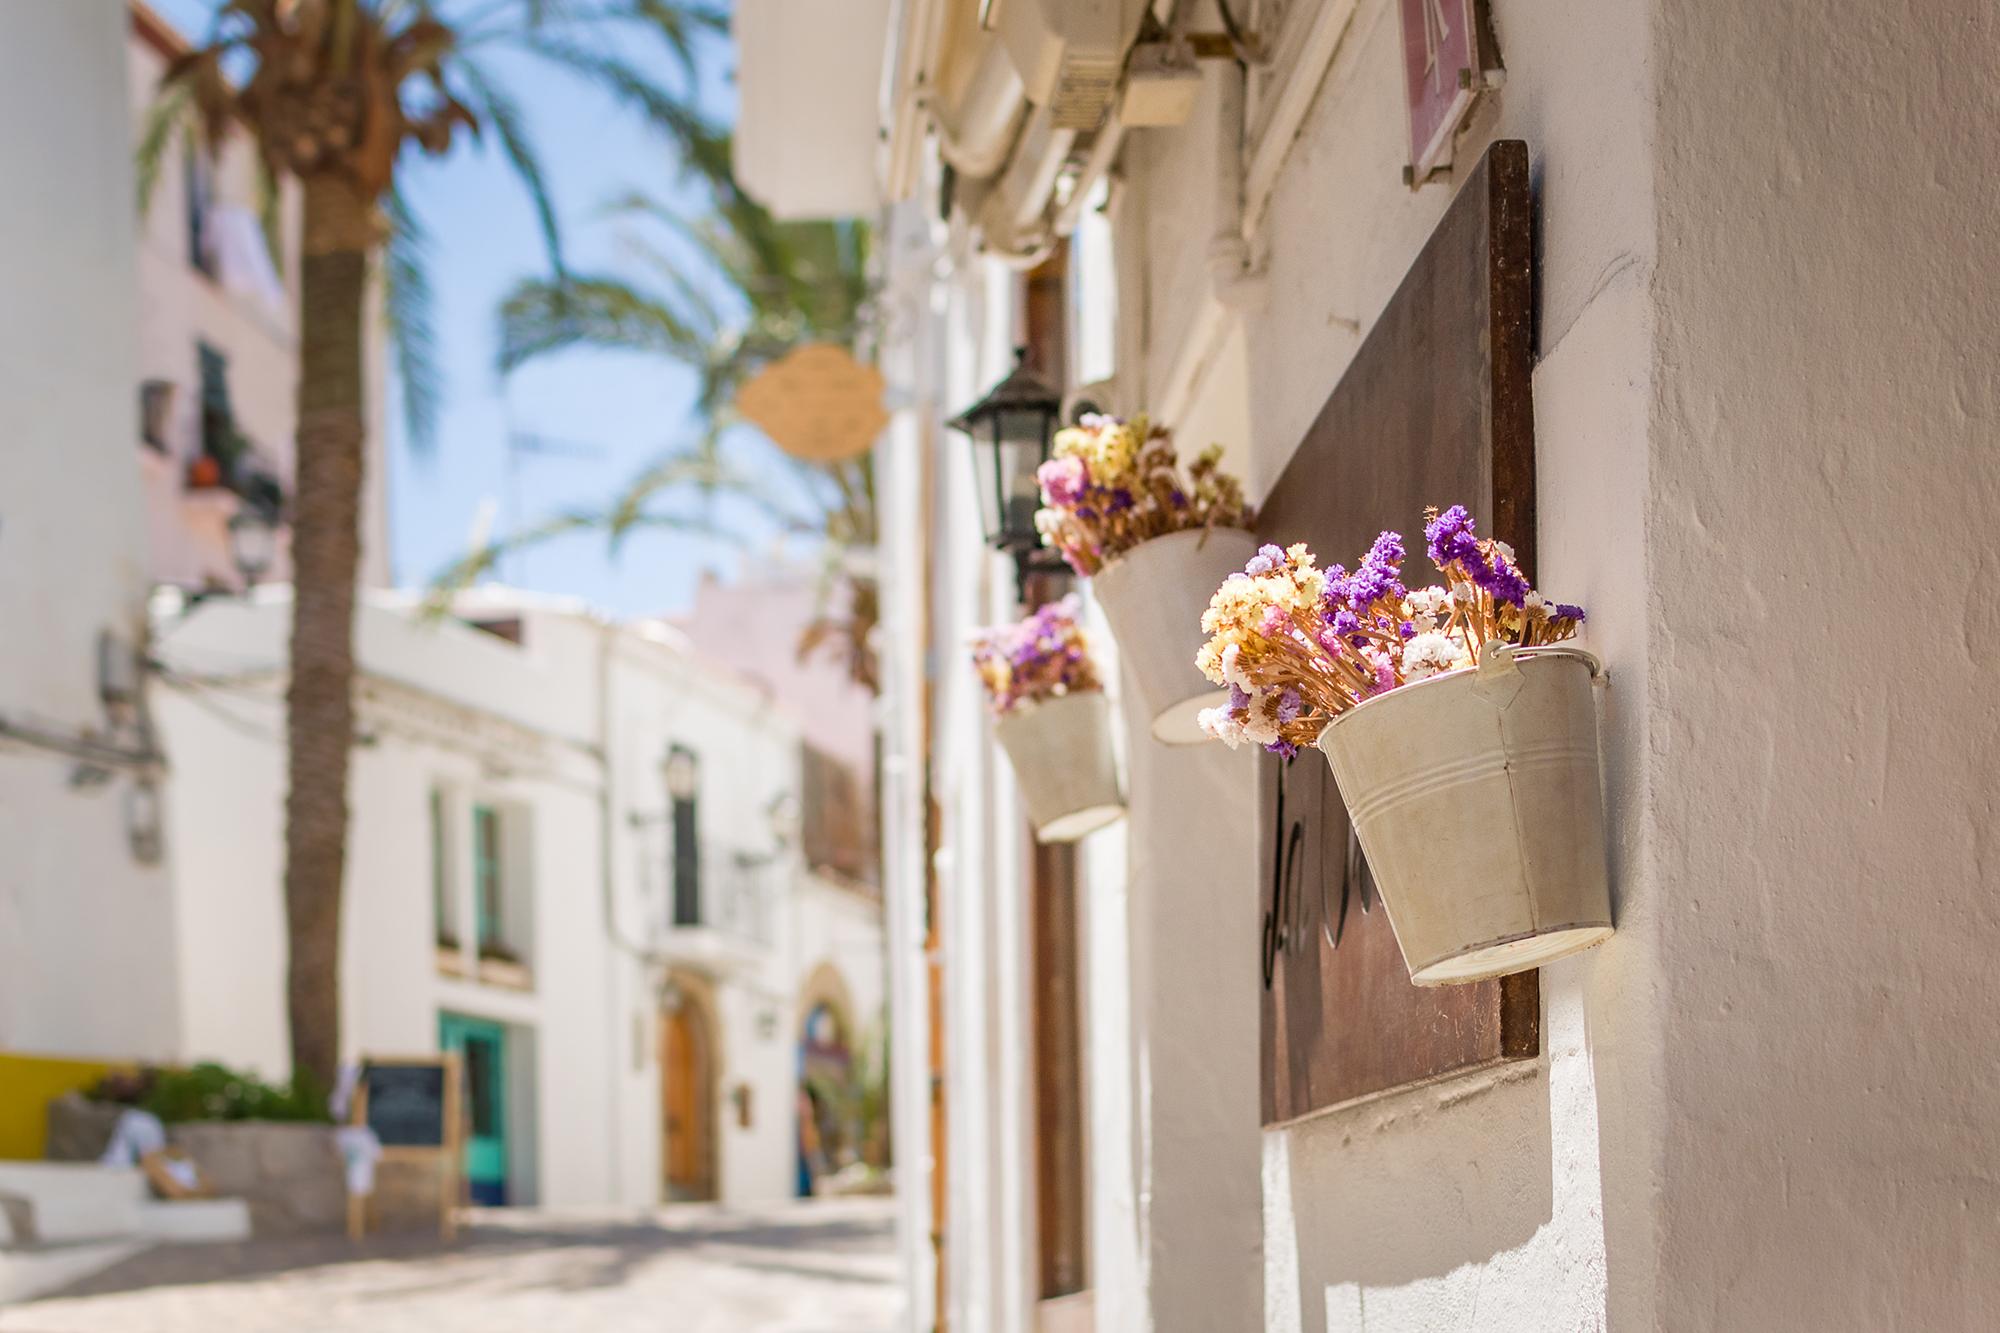 160525 - Ibiza - Daytime - Ibiza Town 002.jpg